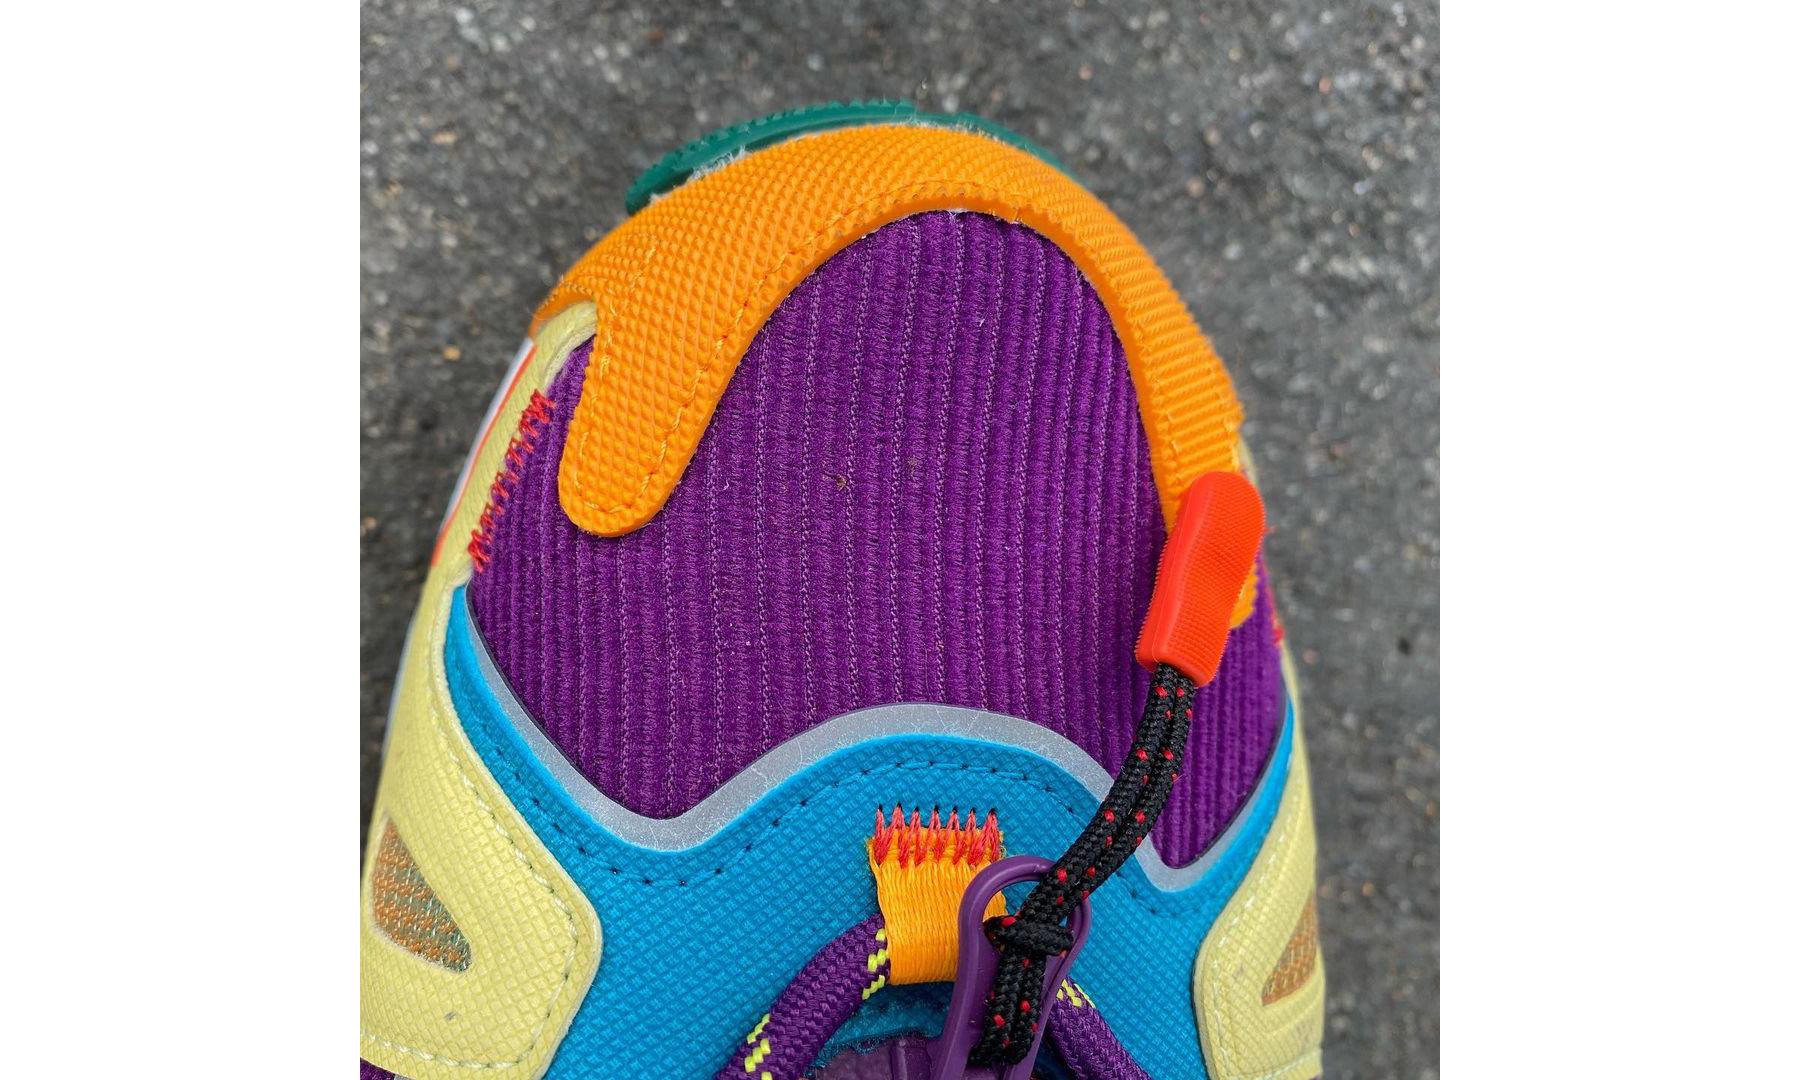 Sean Wotherspoon 曝光最新 adidas Originals 联名鞋款